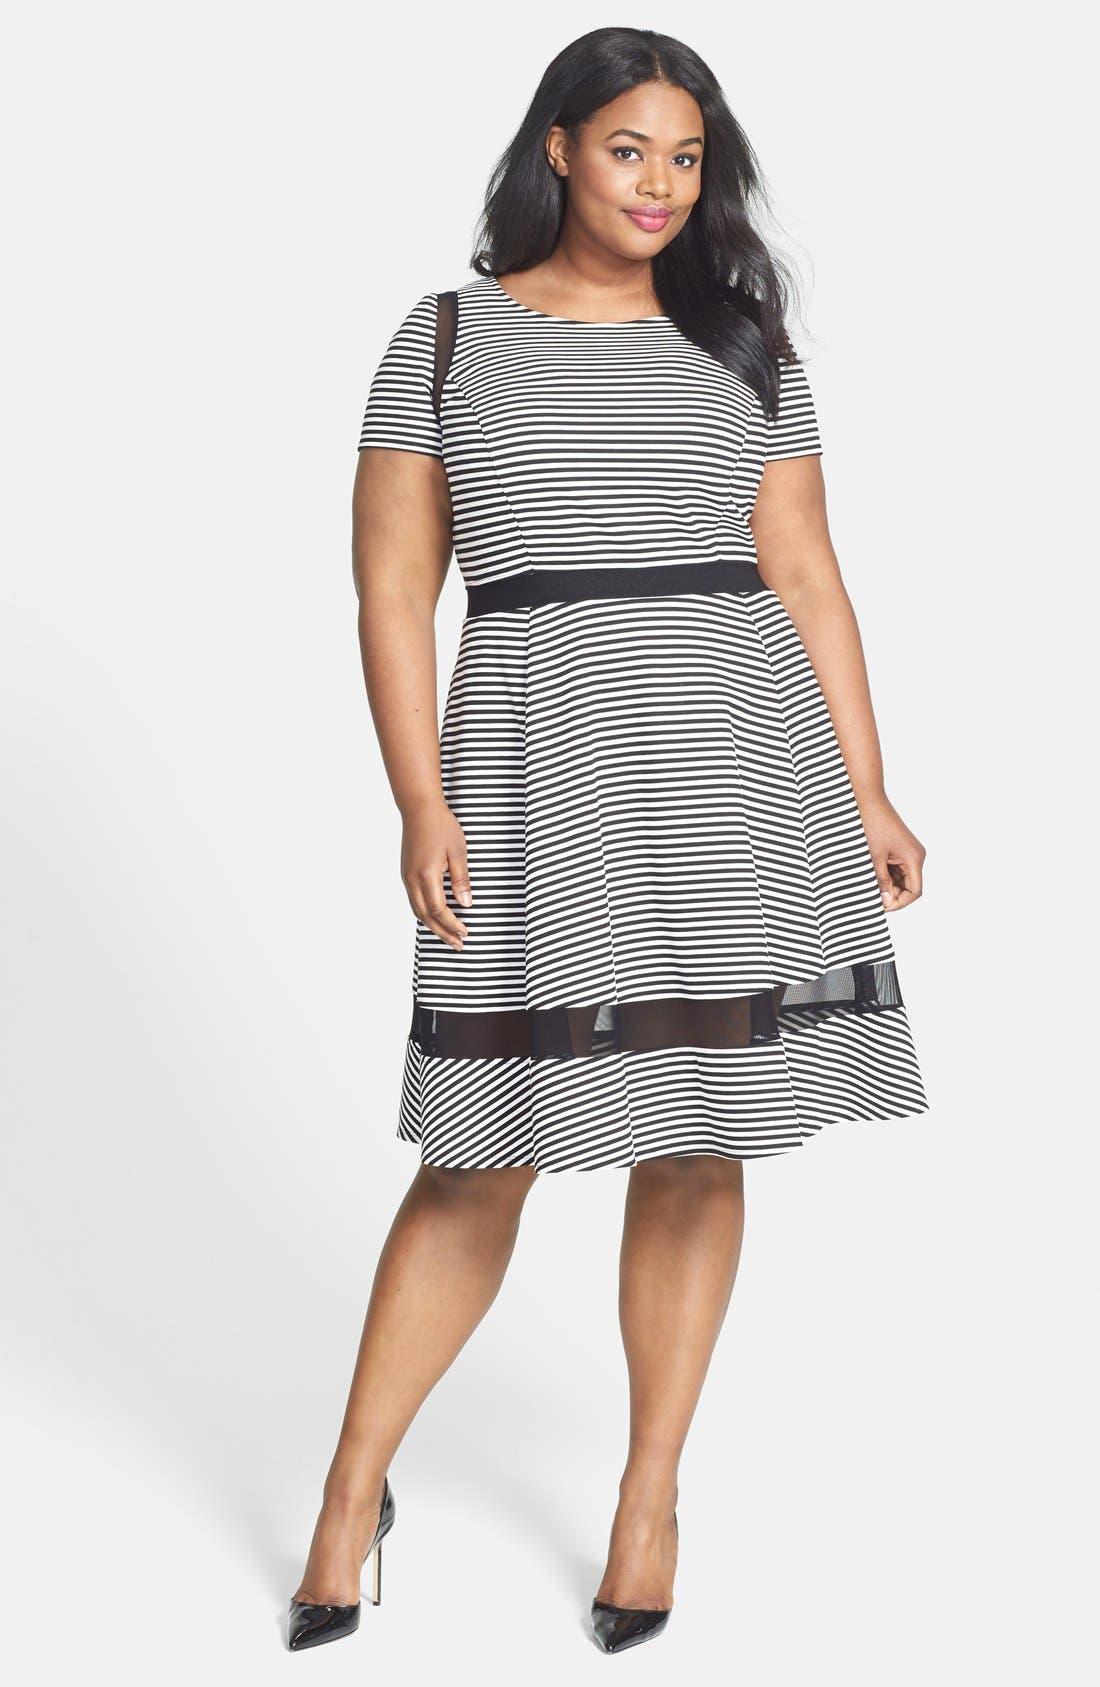 Main Image - ABS by Allen Schwartz Mesh Inset Stripe Fit & Flare Dress (Plus Size)